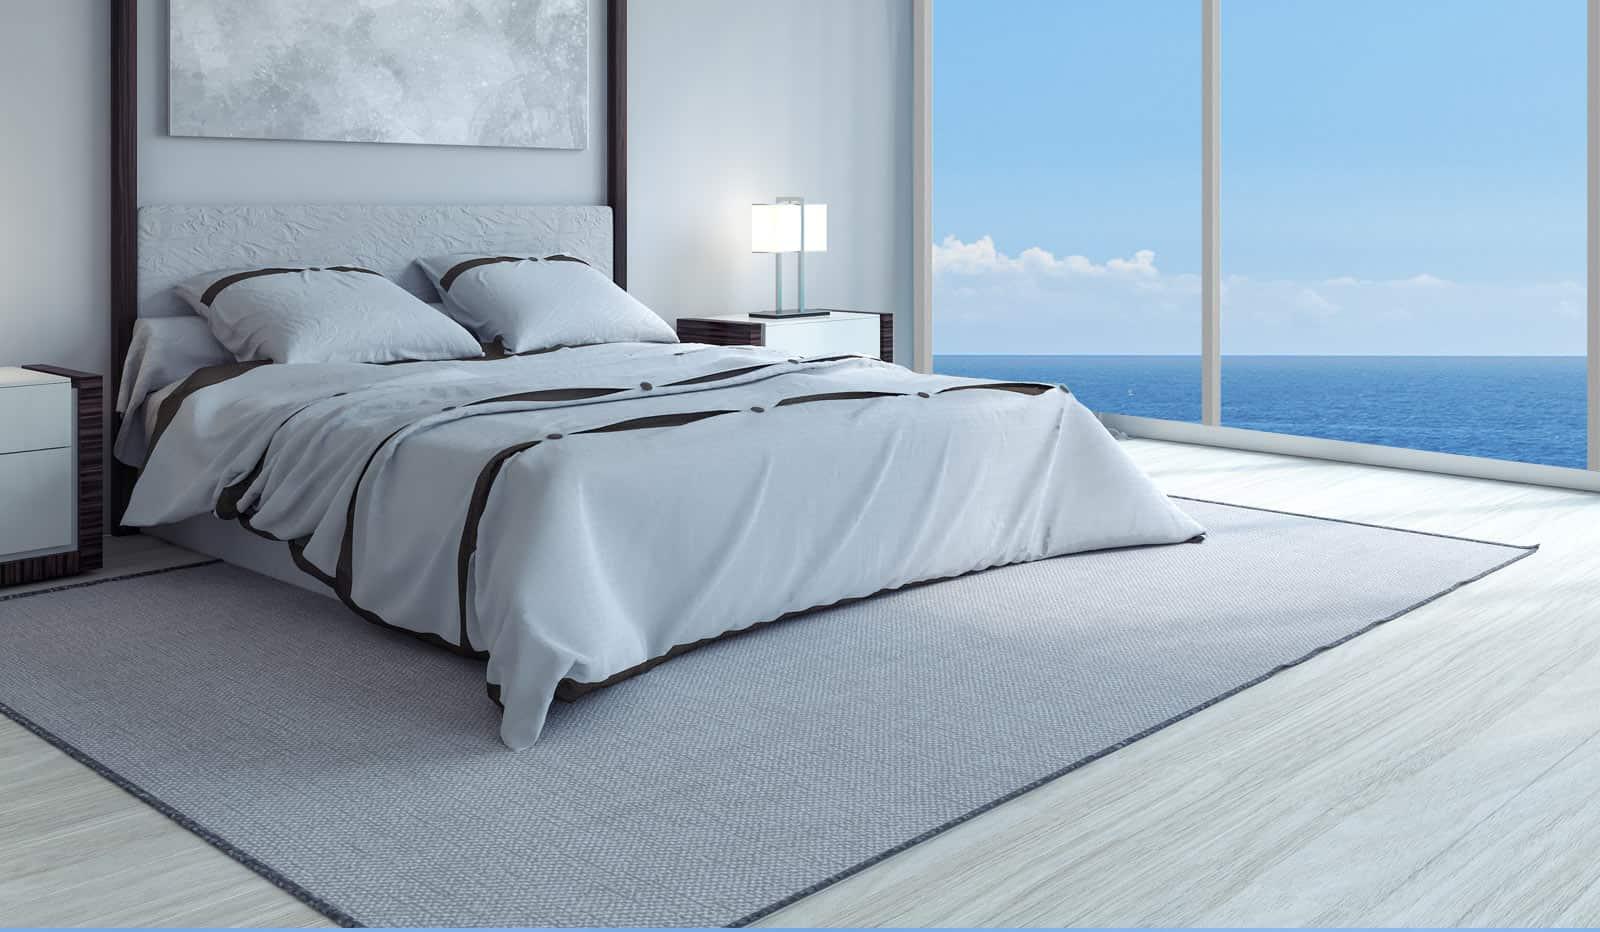 Riviera Varazze apartments, penthouses